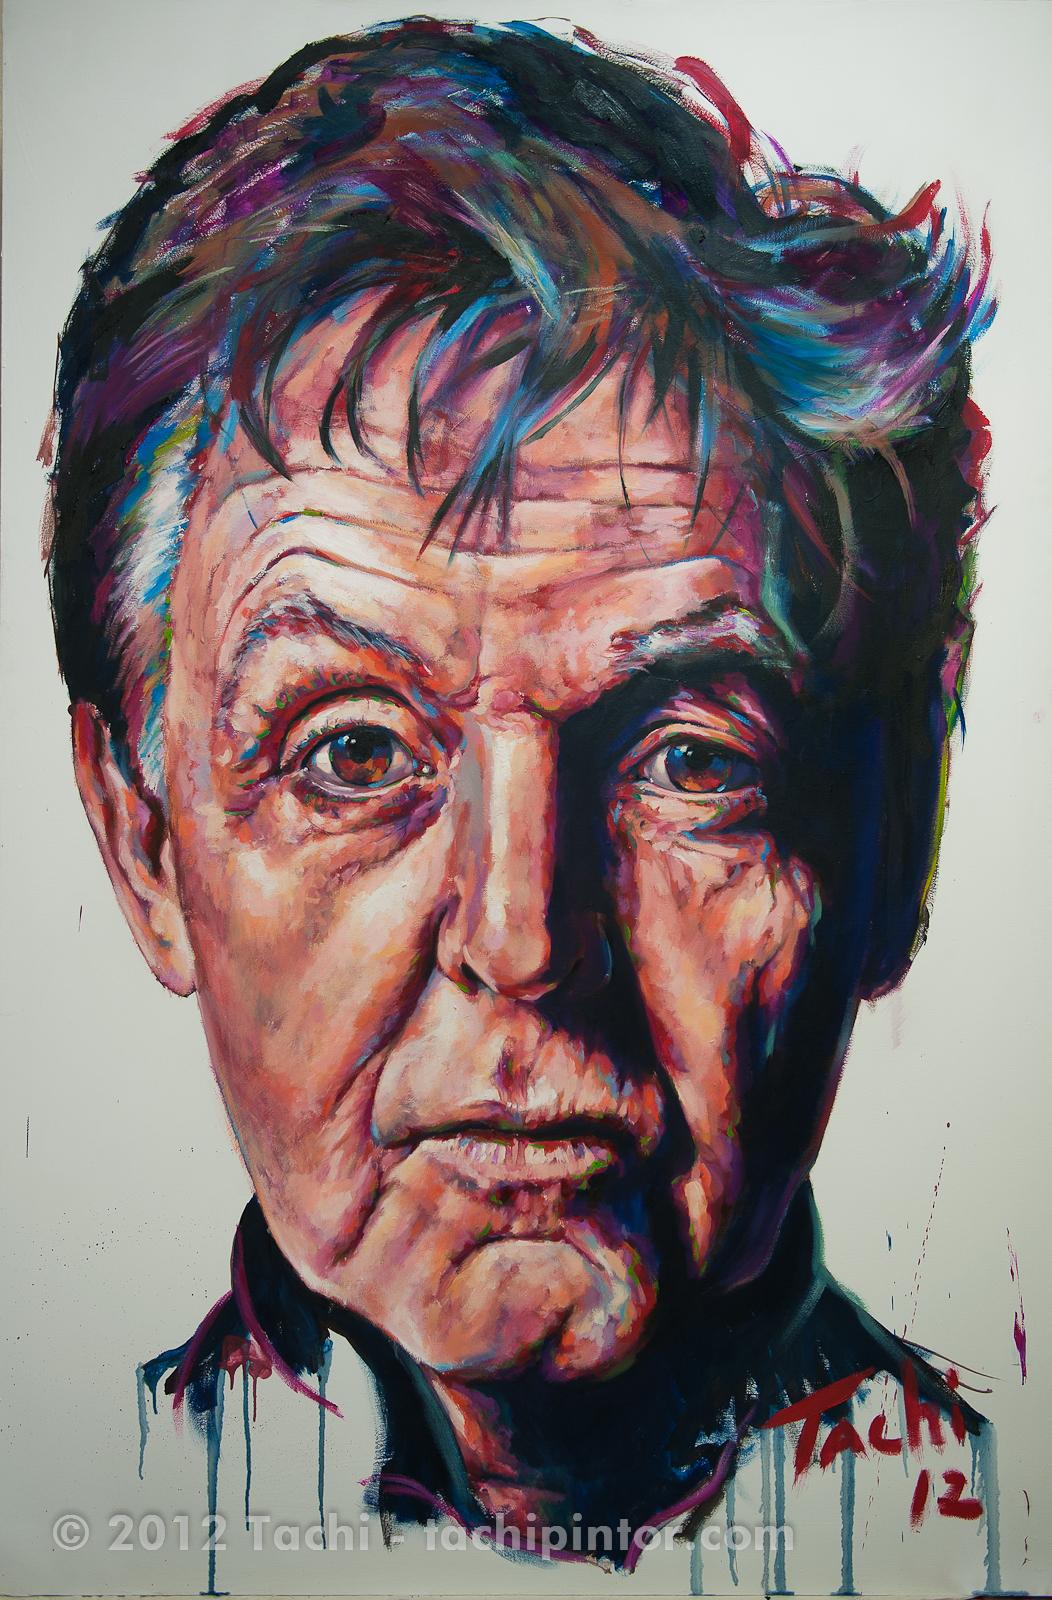 Paul McCartney by Tachi - © Tachipintor.com